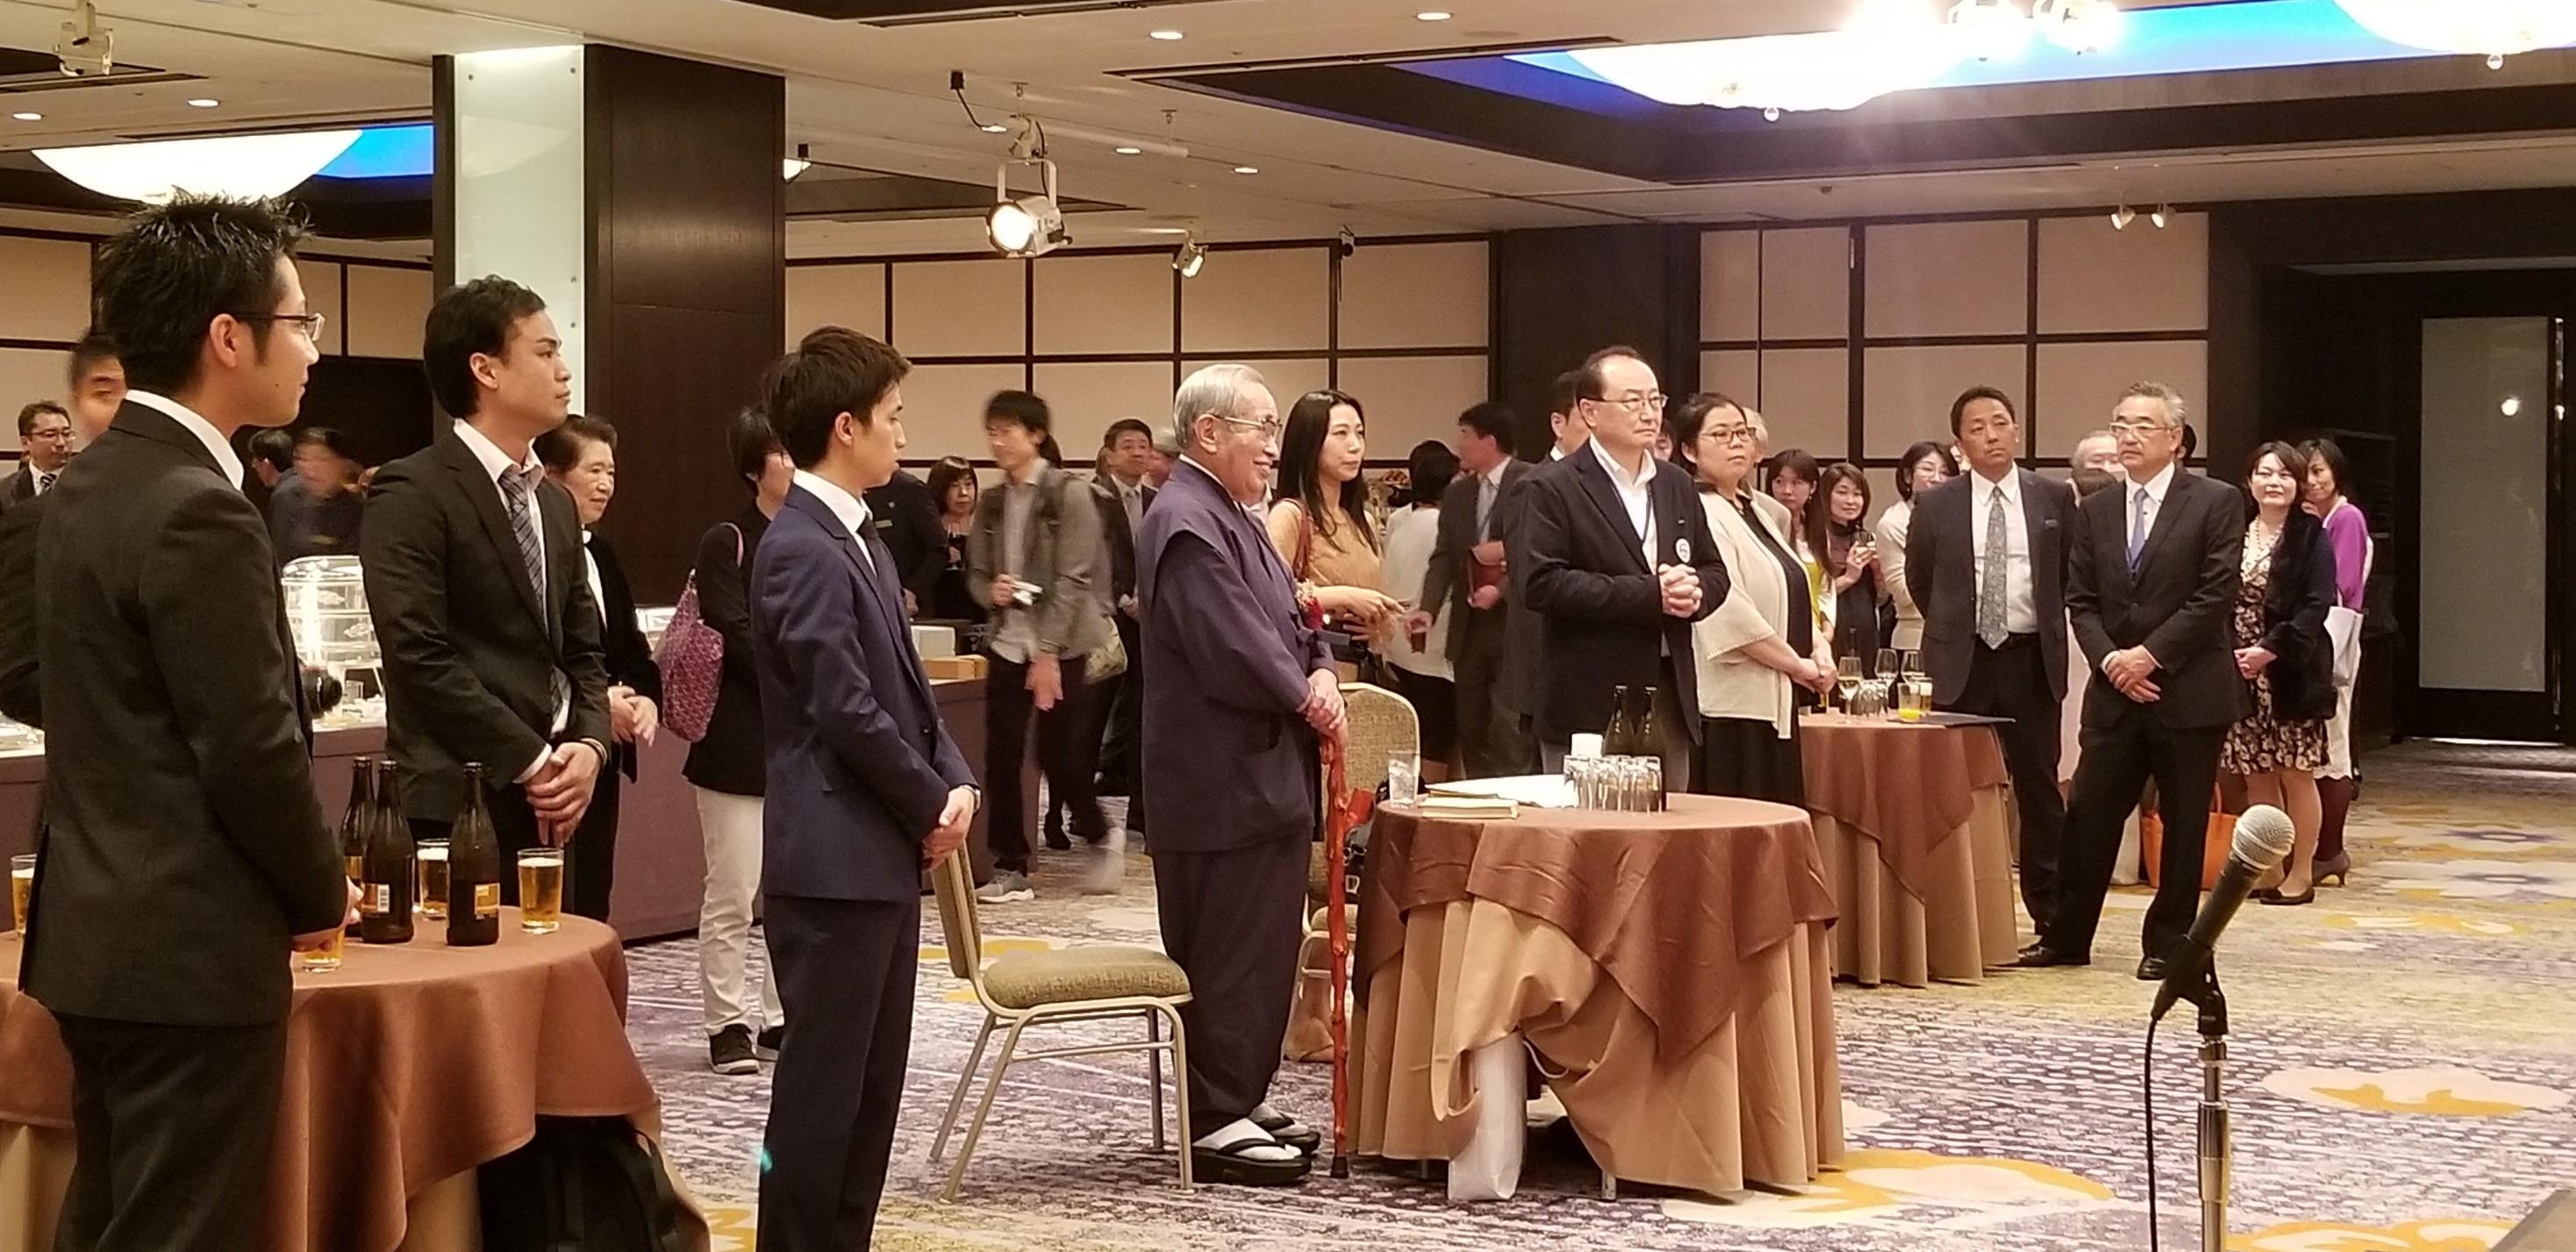 9eddba5f53a653d3baef6c5f155cd6b2 - 第6回思風会全国大会2018in東京開催